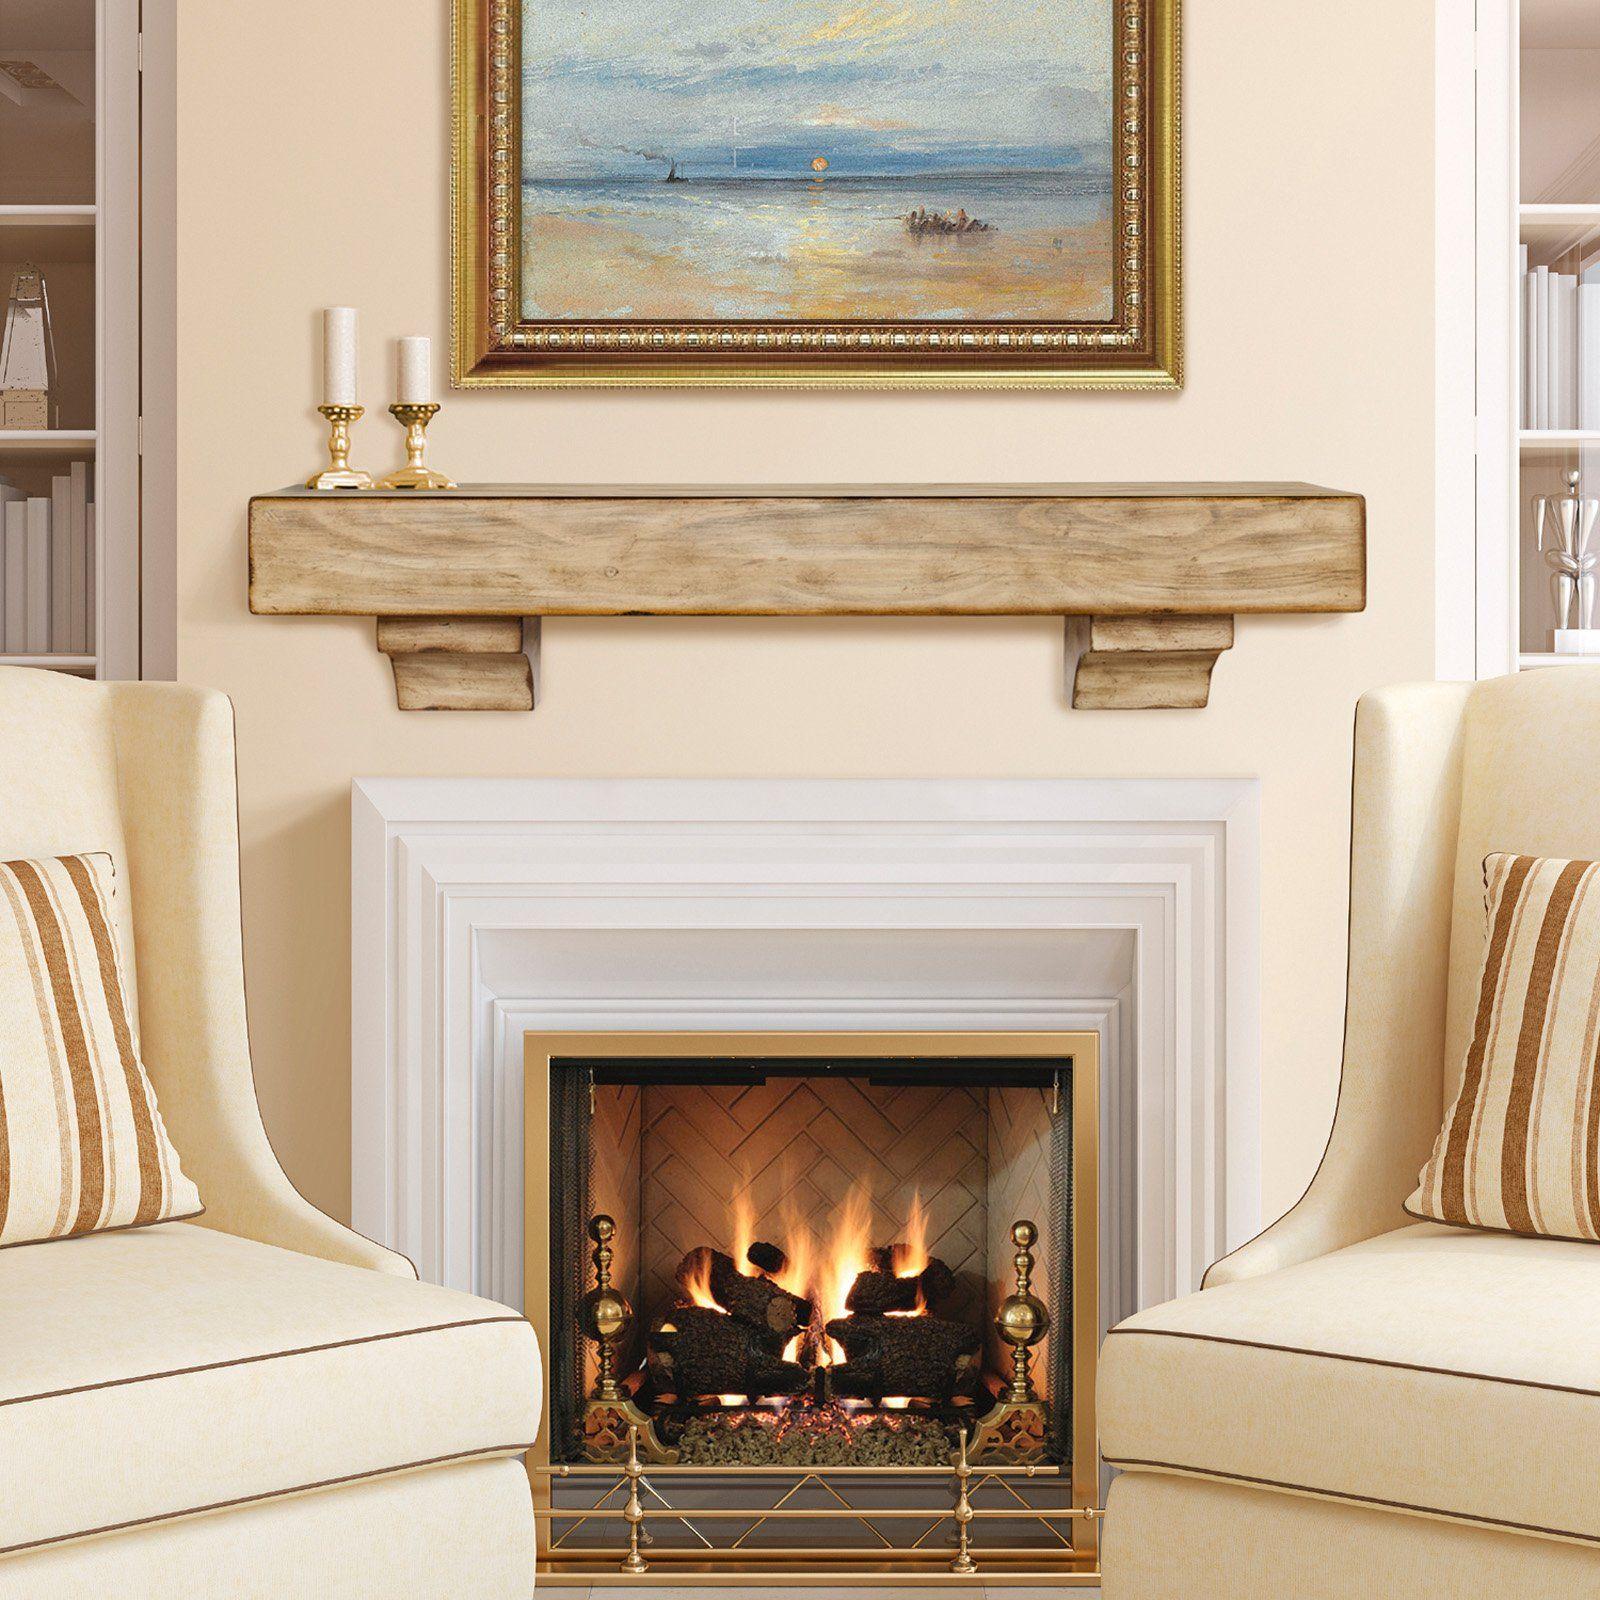 Contemporary Fireplace Fireplacedecorideas Contemporary